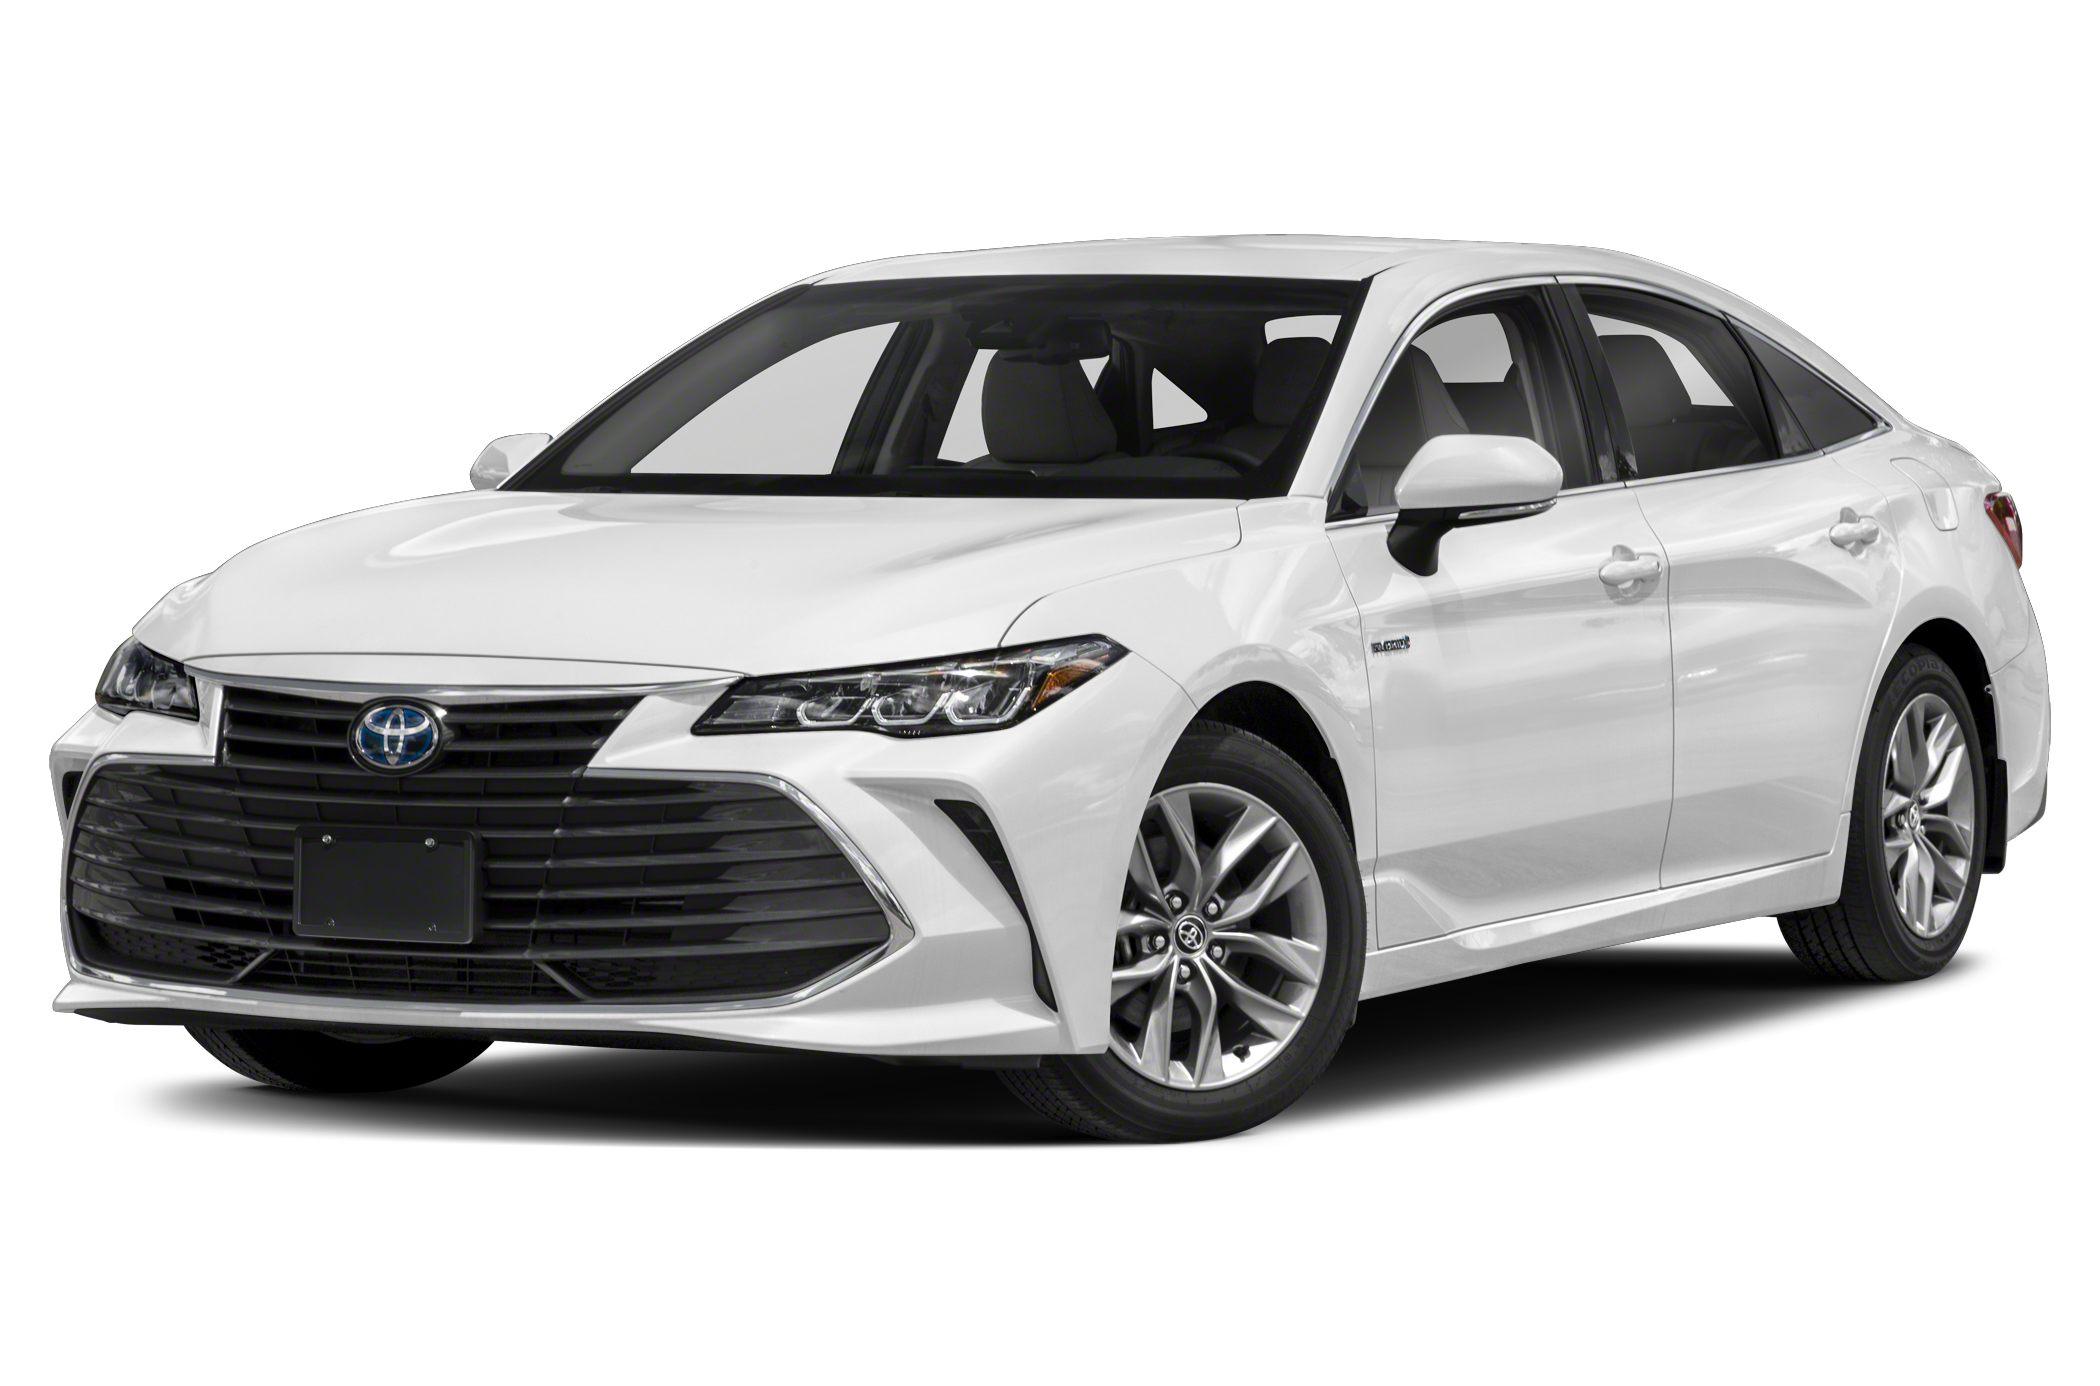 2020 Toyota Avalon Hybrid New Model and Performance